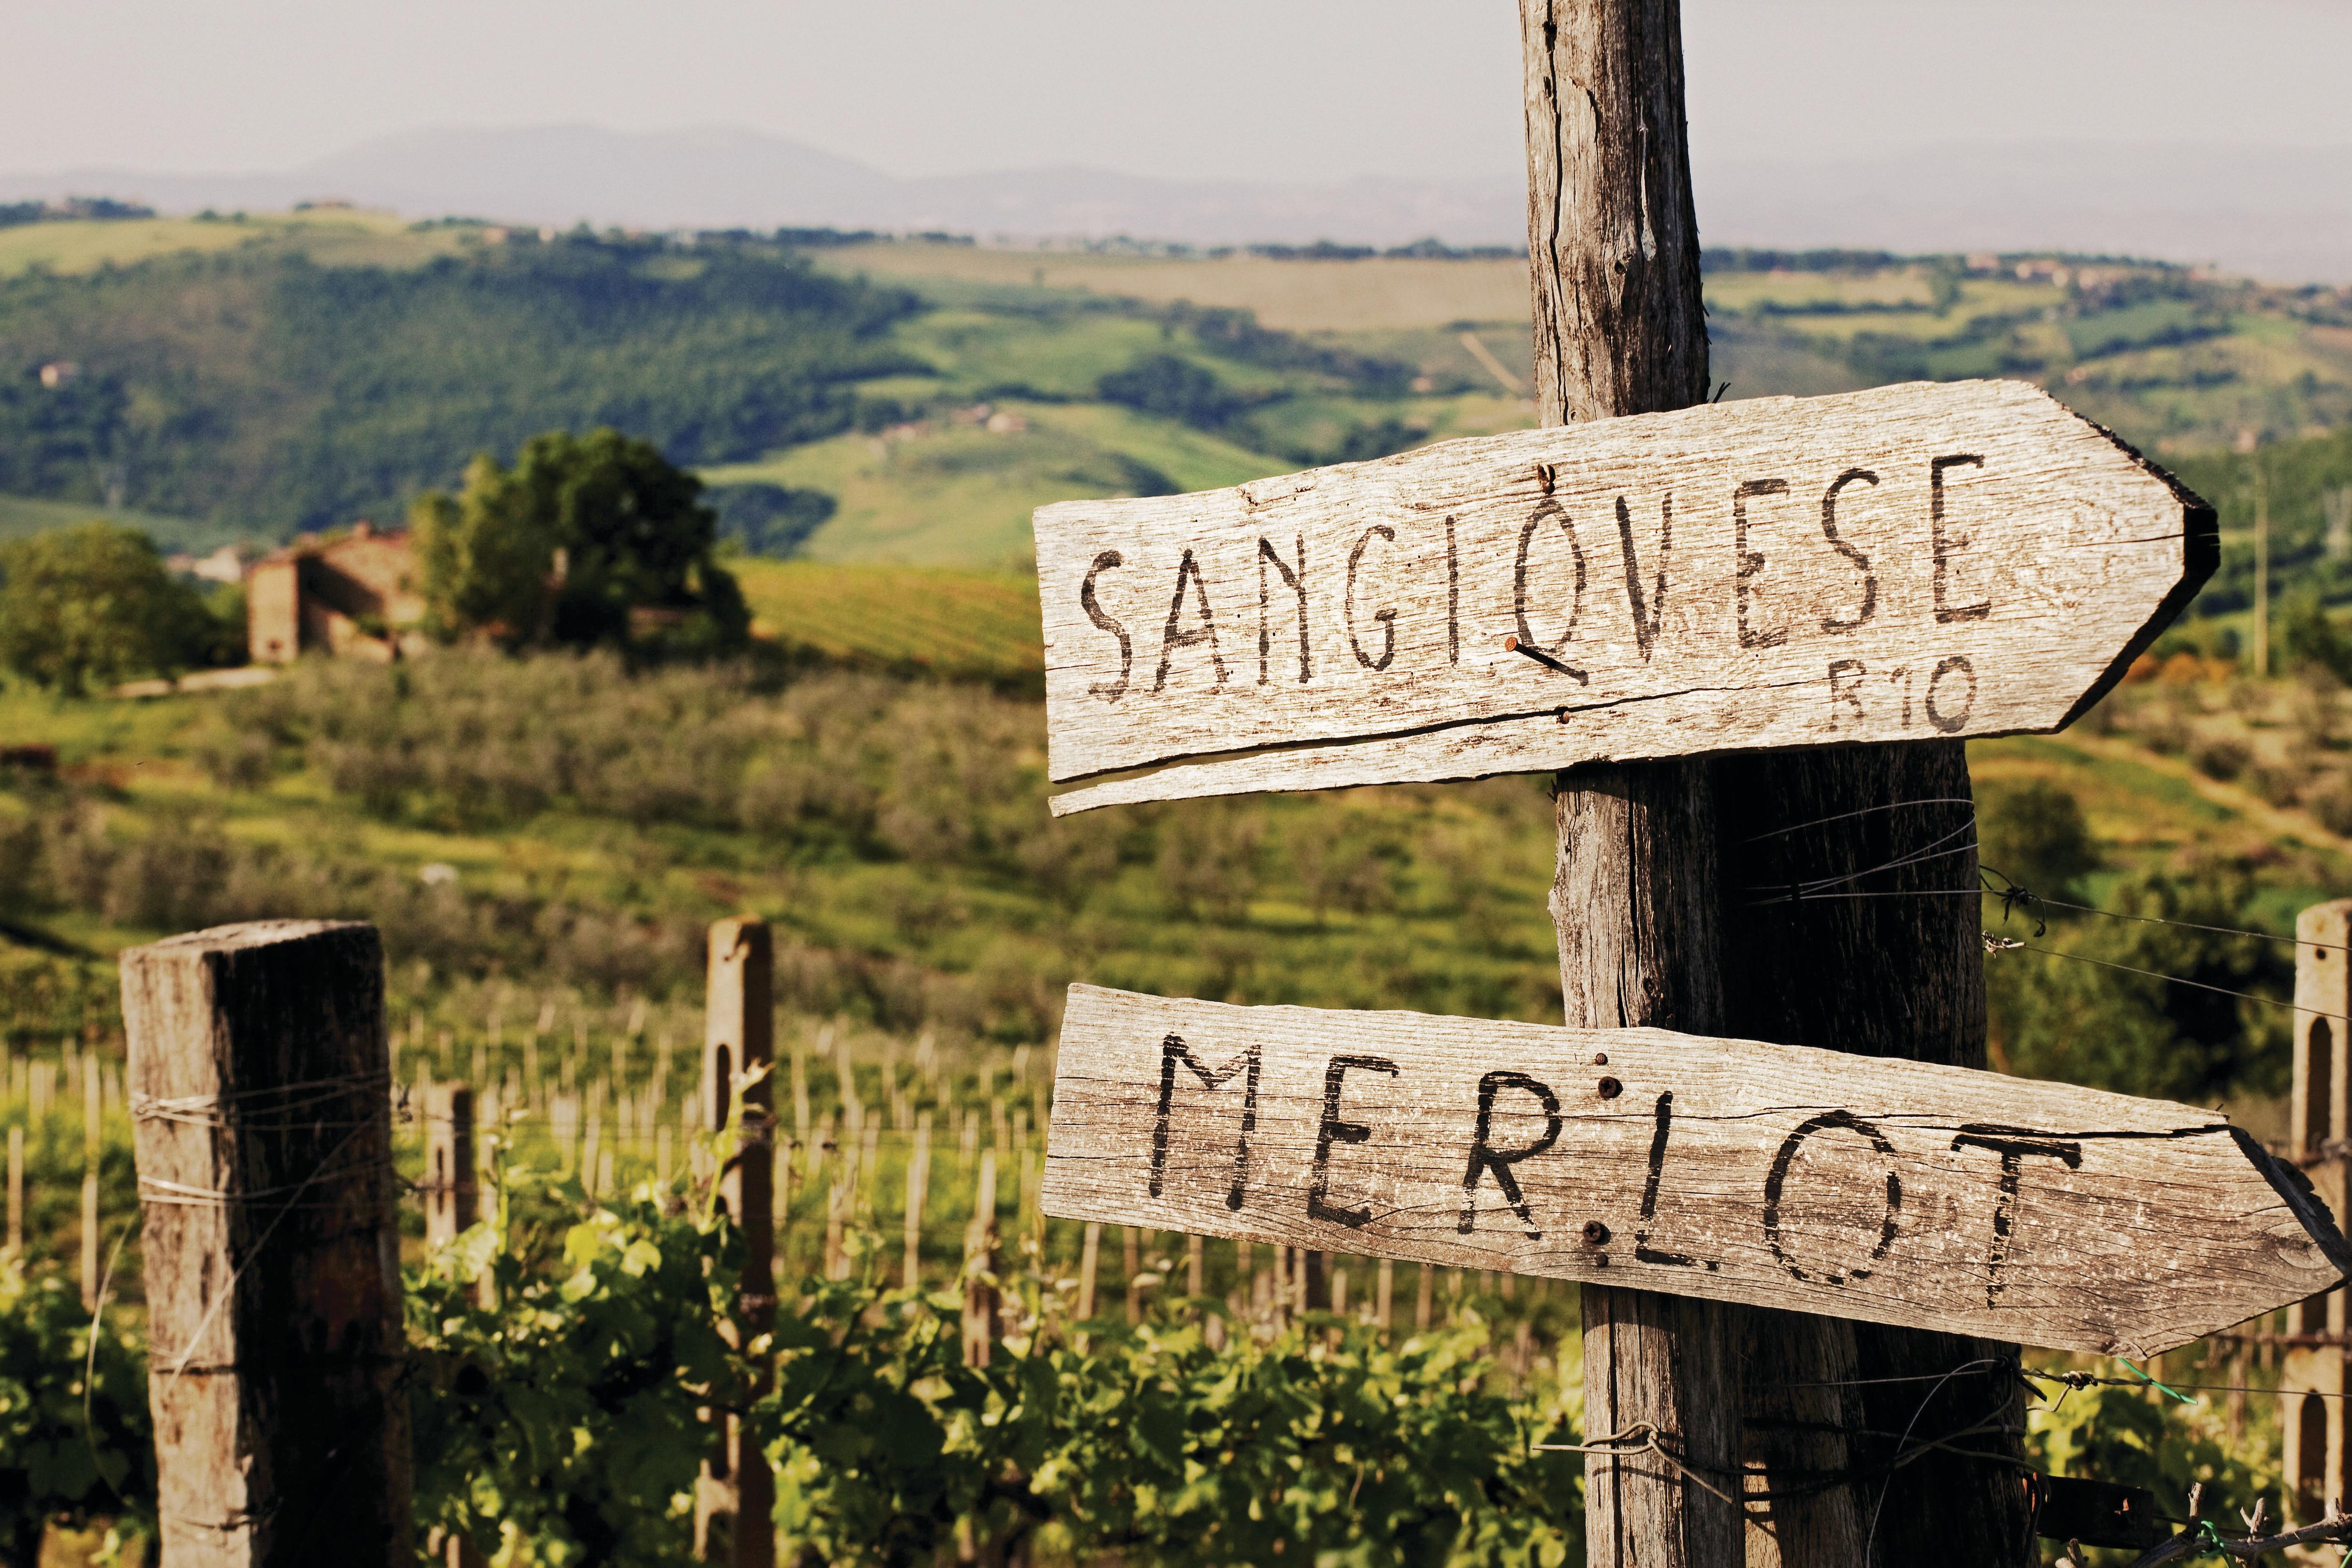 Wine tour sign, Tuscany, Italy